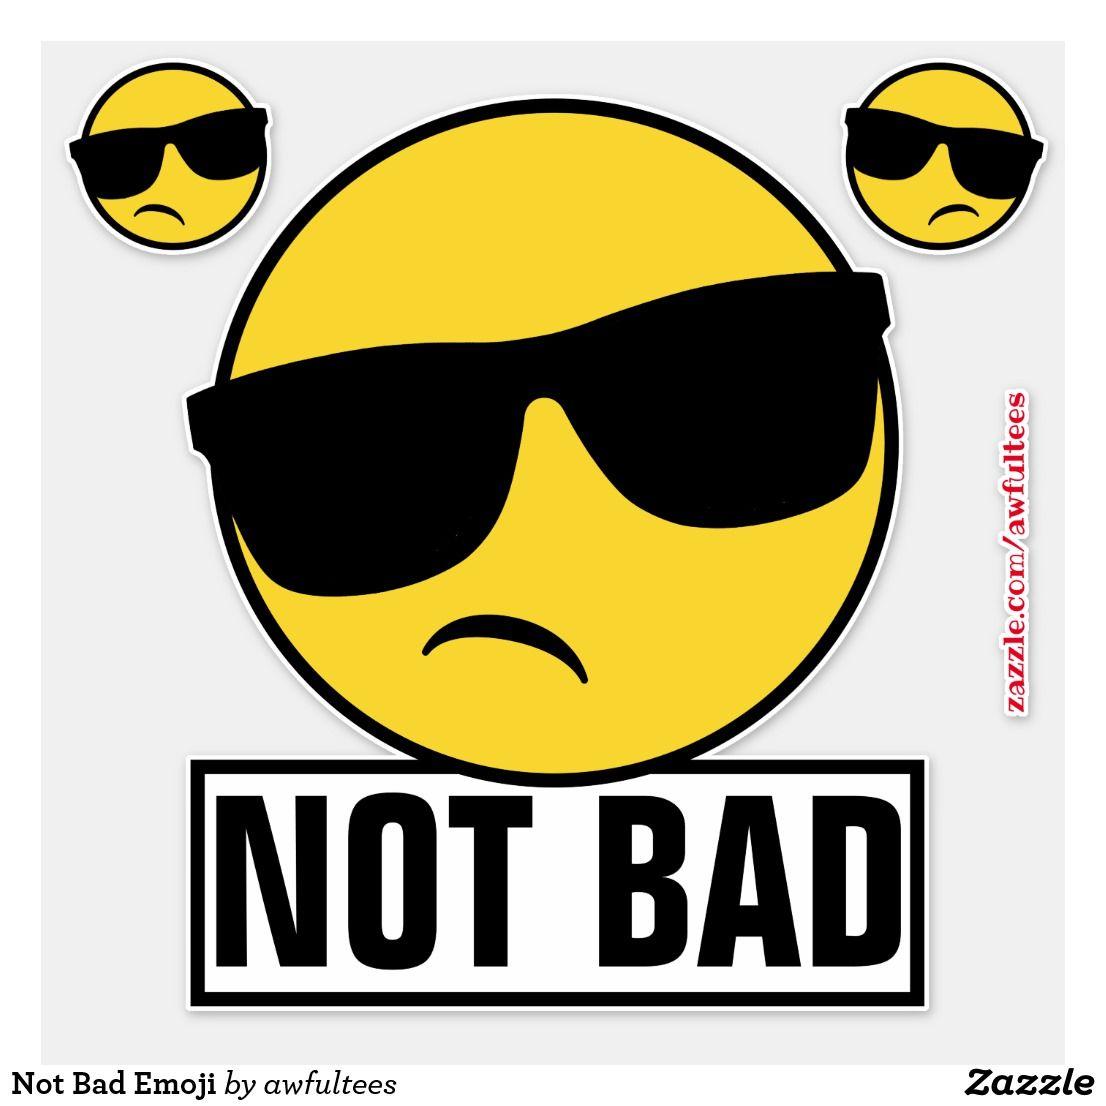 Not Bad Emoji Sticker Zazzle Com Emoji Stickers Face Icon Design Your Own Stickers